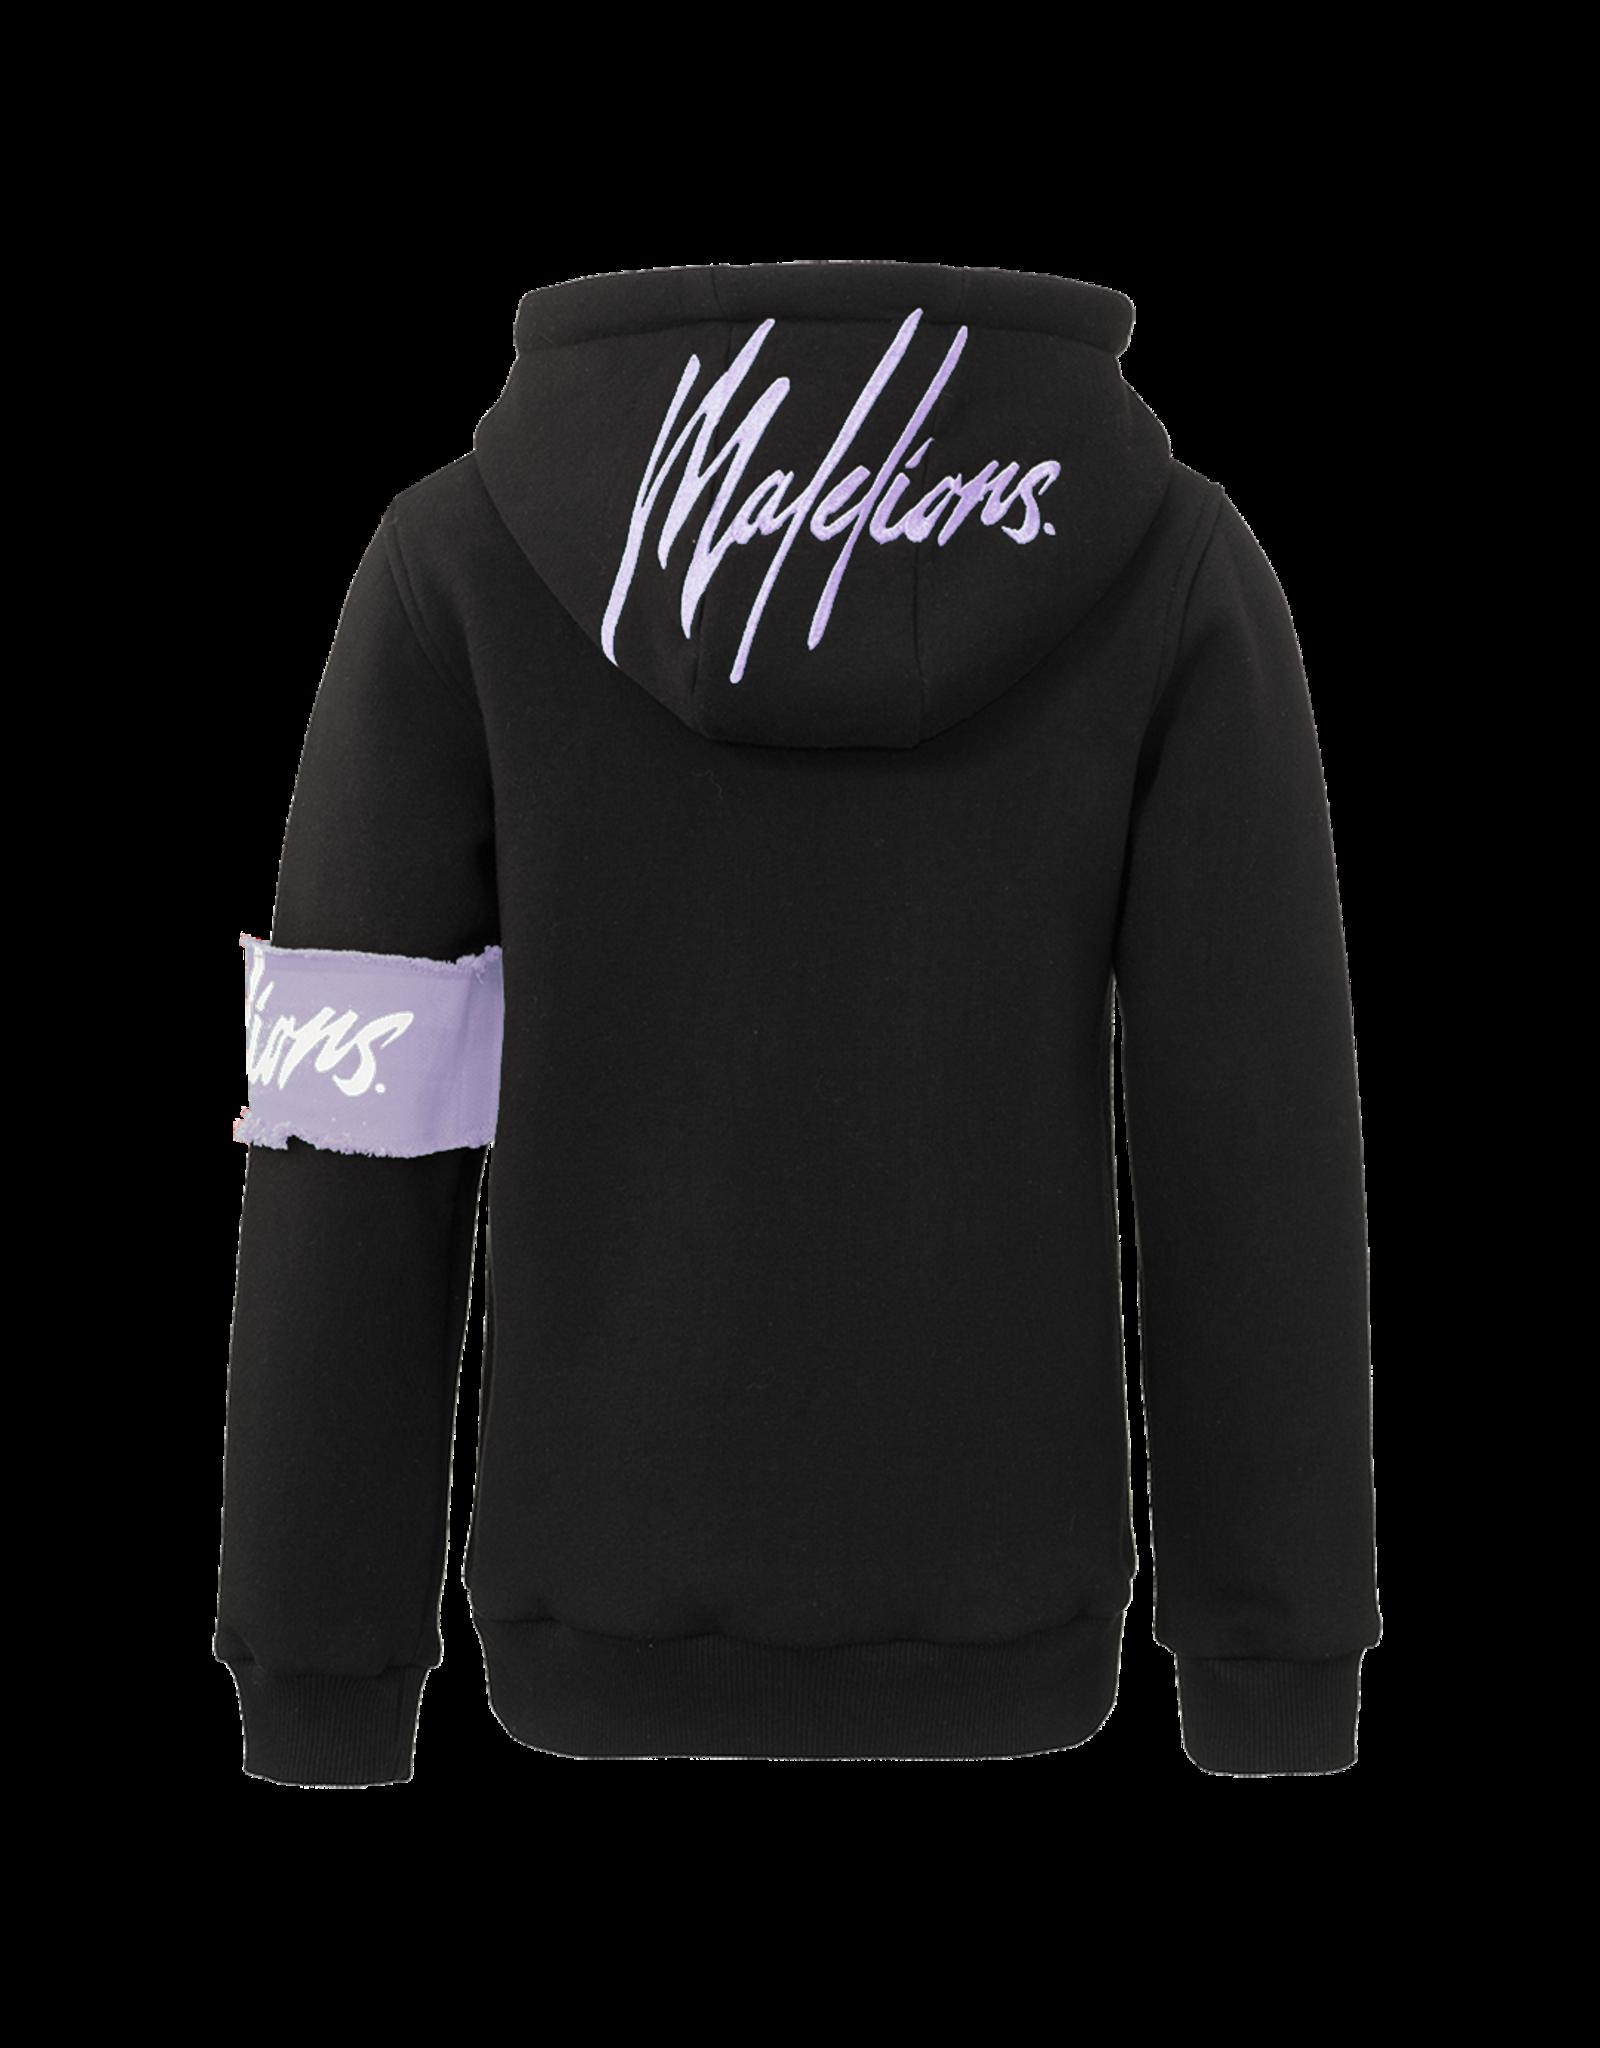 Malelions Malelions Junior Captain Hoodie Black/Purple